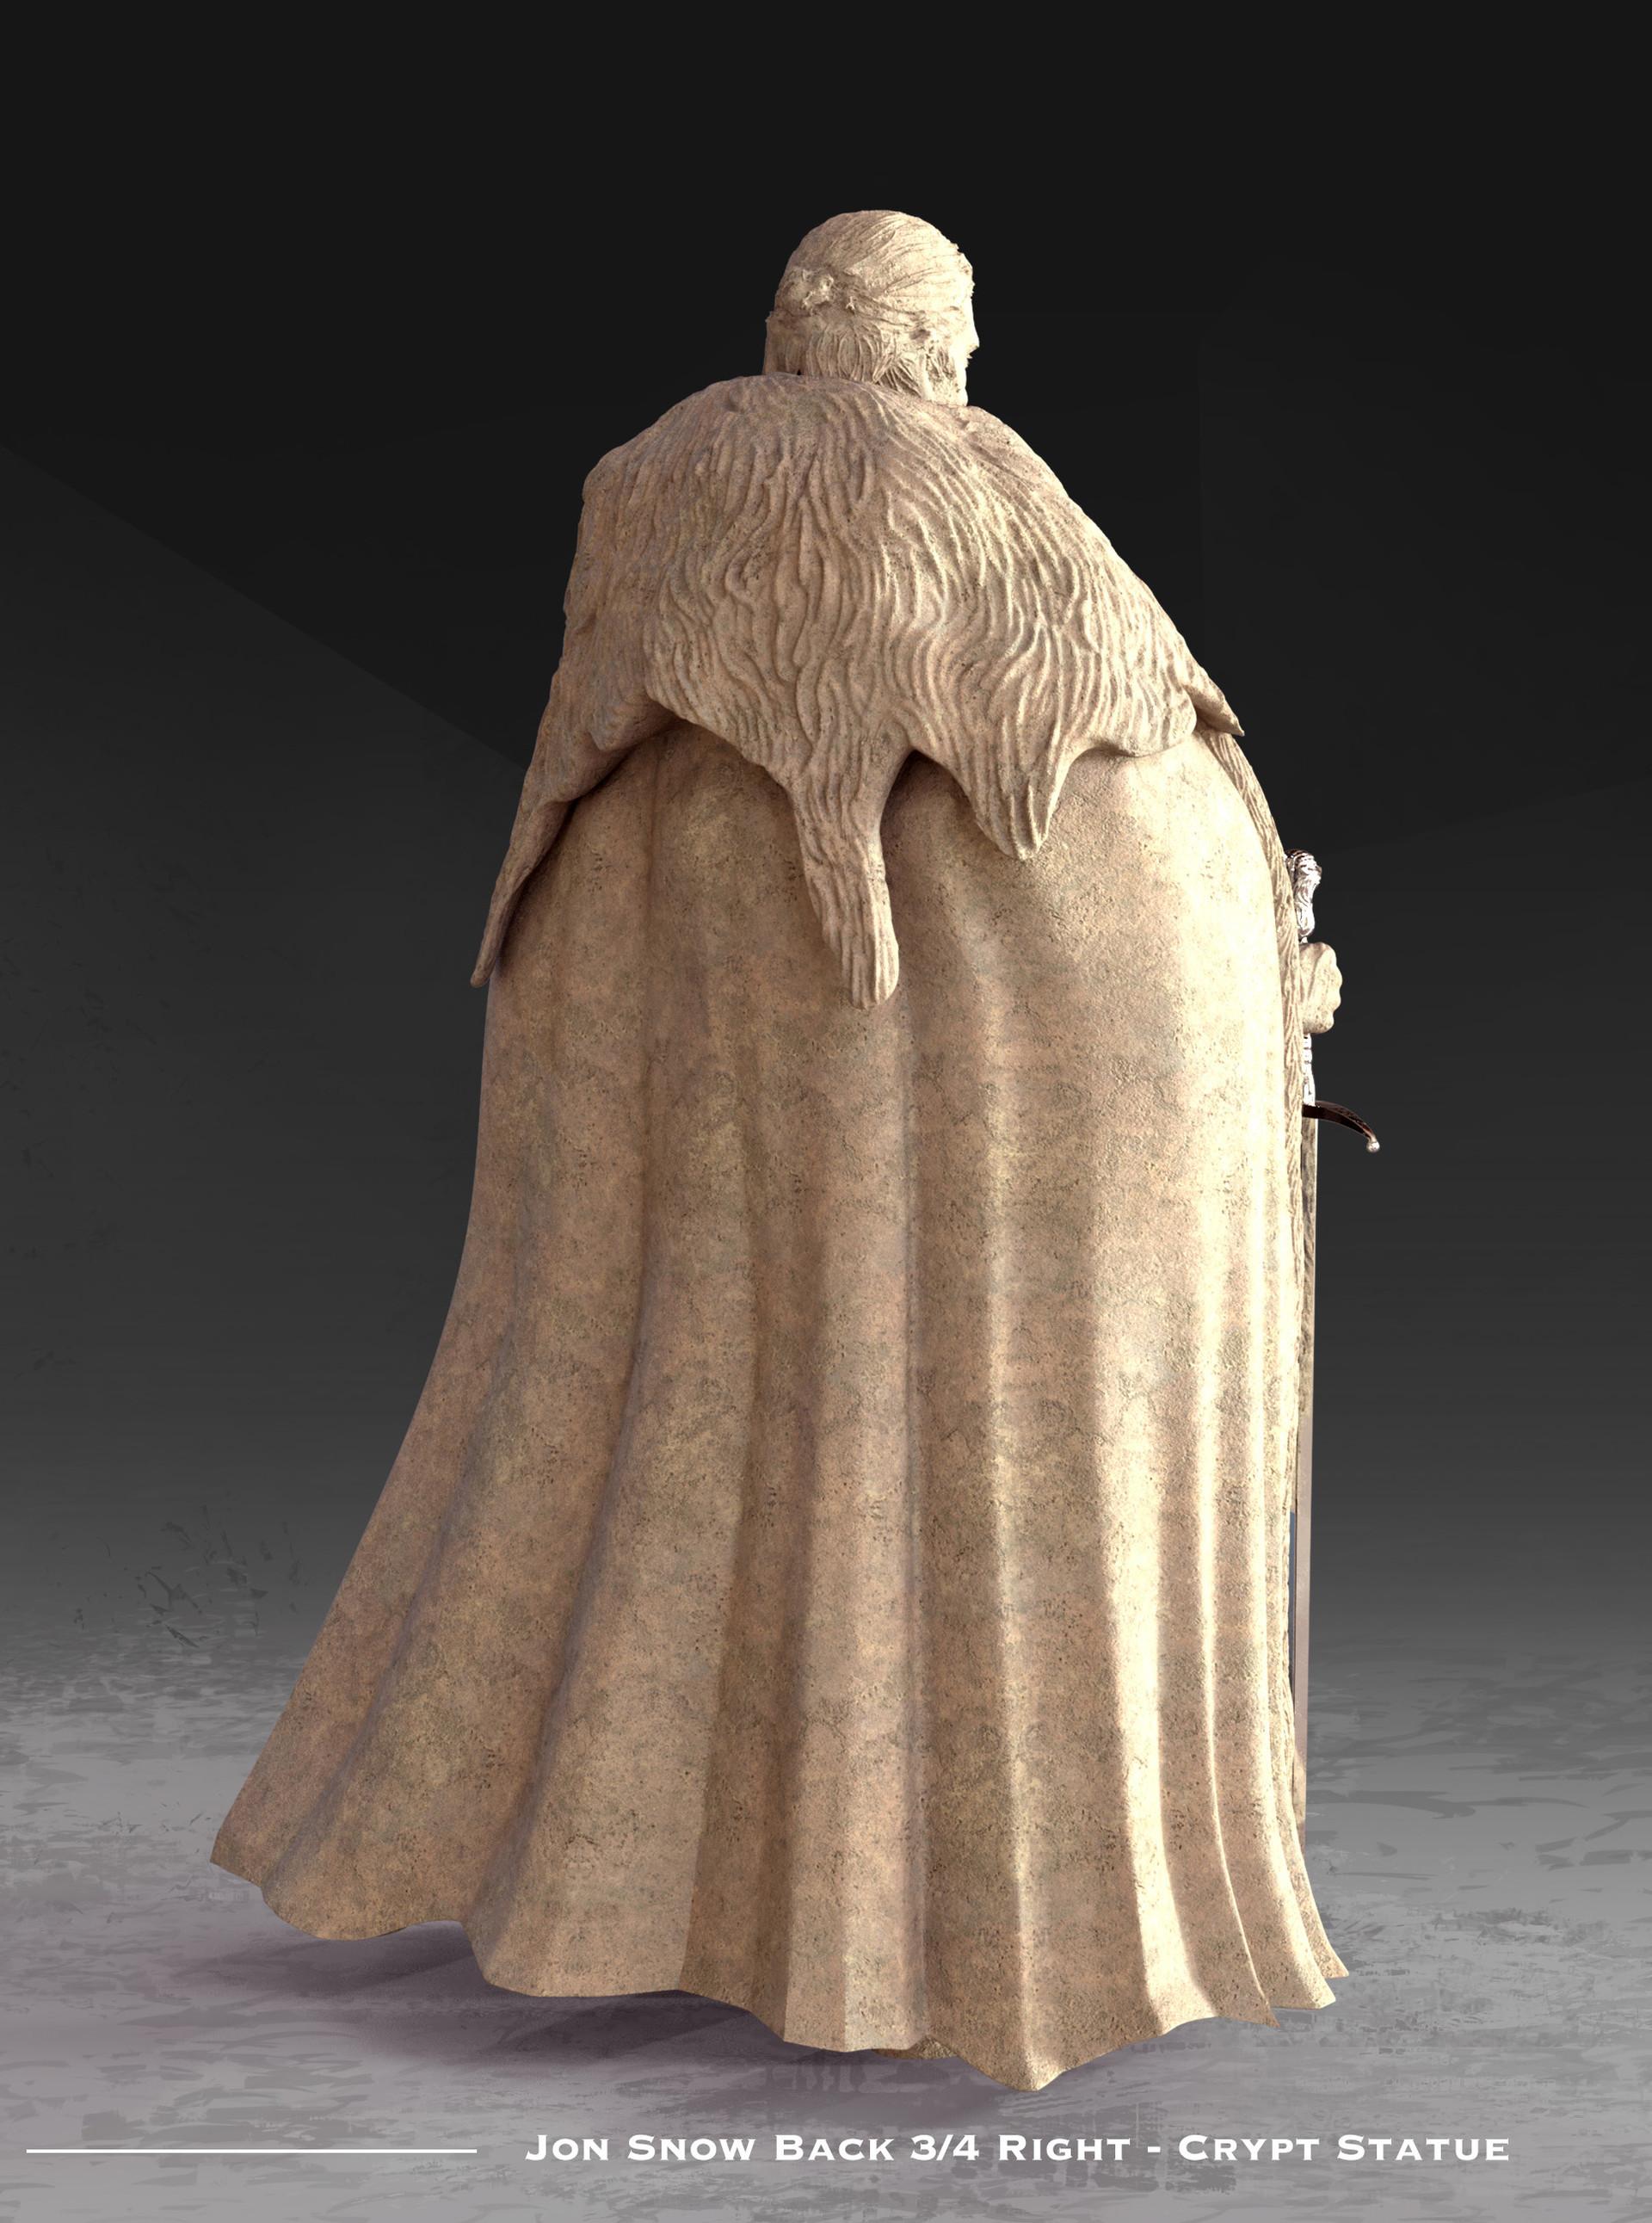 Kieran belshaw jon statue back 3qright v001